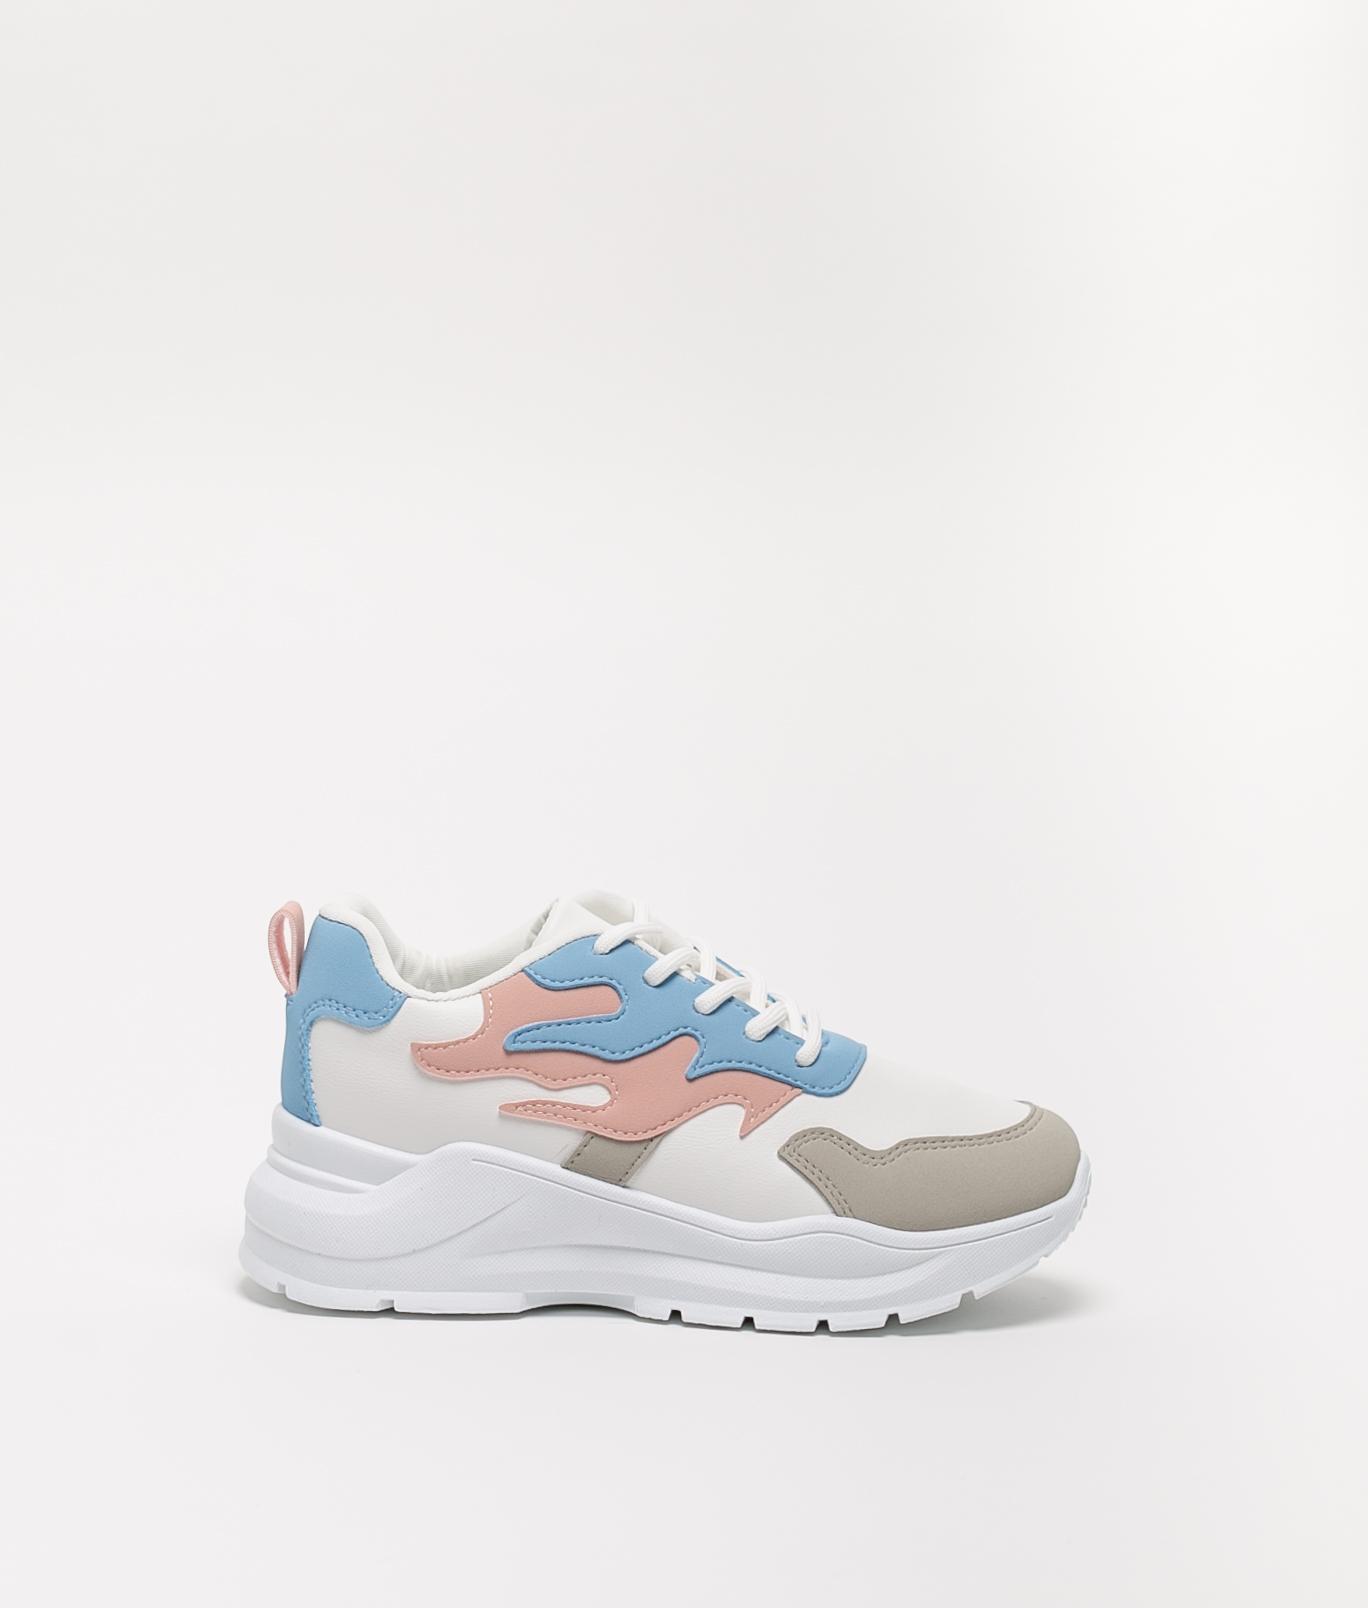 Sneakers Sunco - Bleu clair